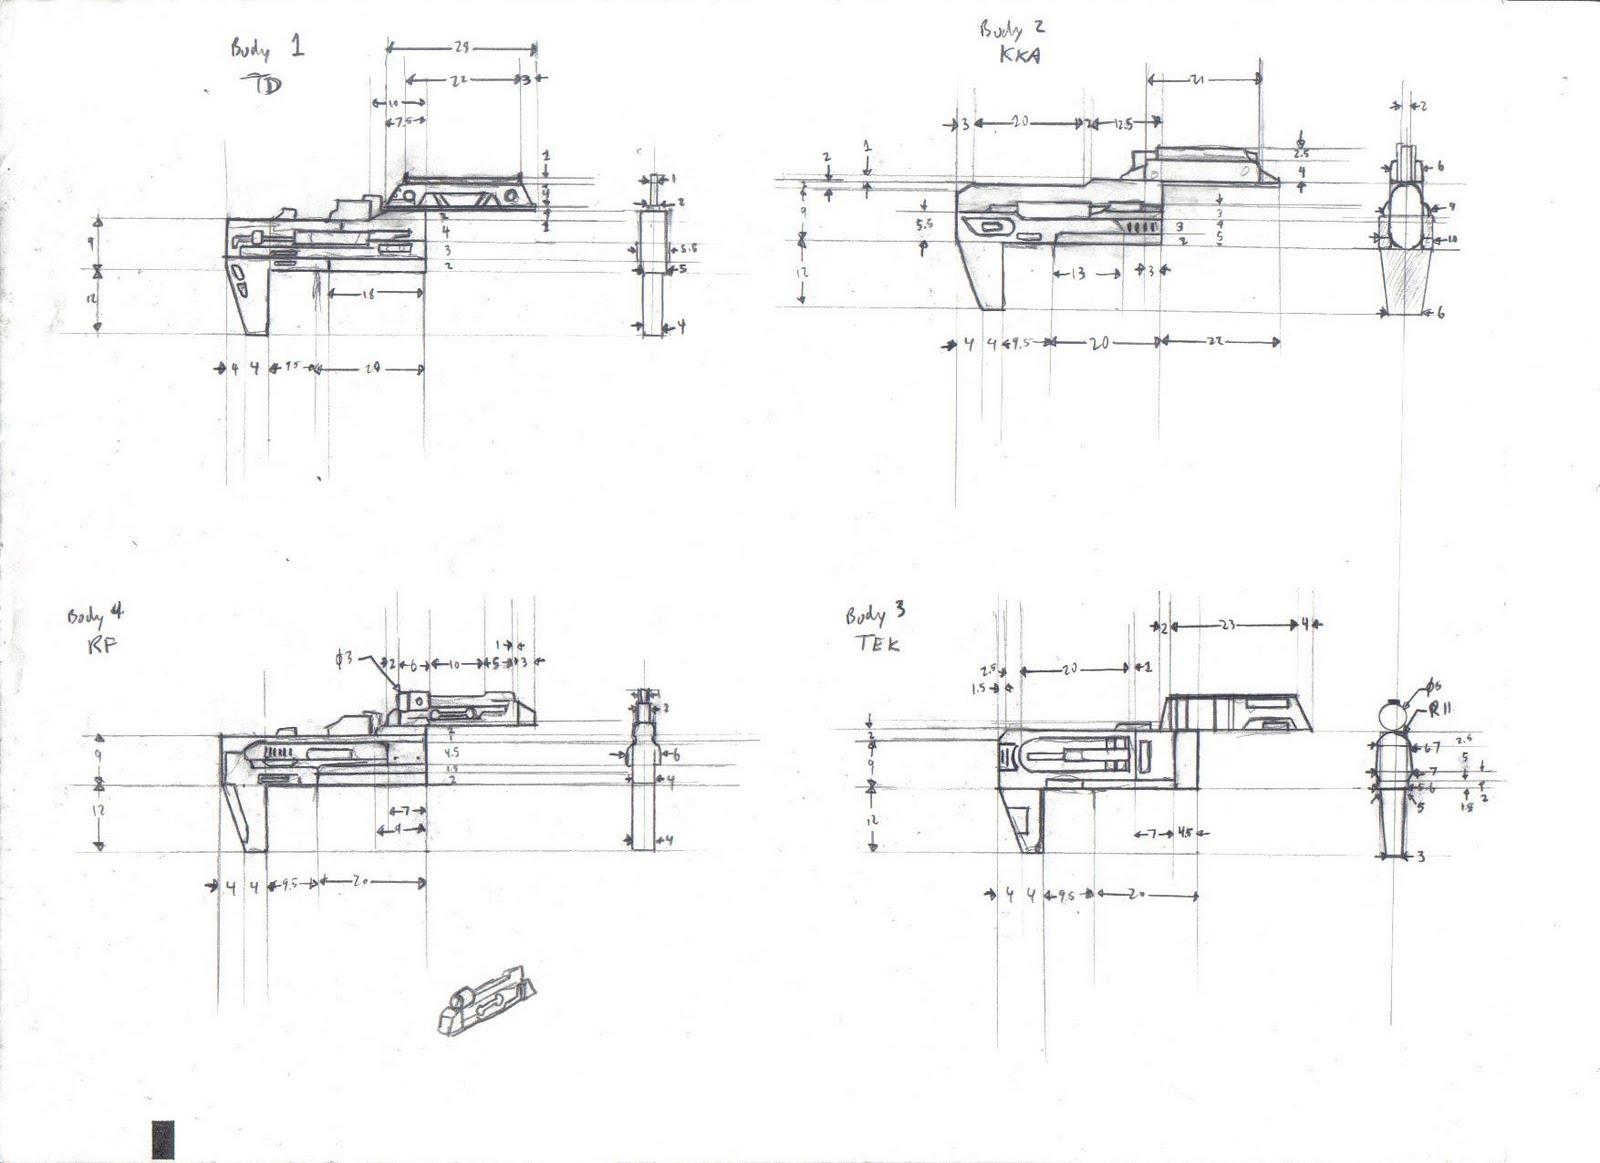 hight resolution of fn p90 diagram wiring diagram third level rh p 90 wirig diagram grease gun diagram glock